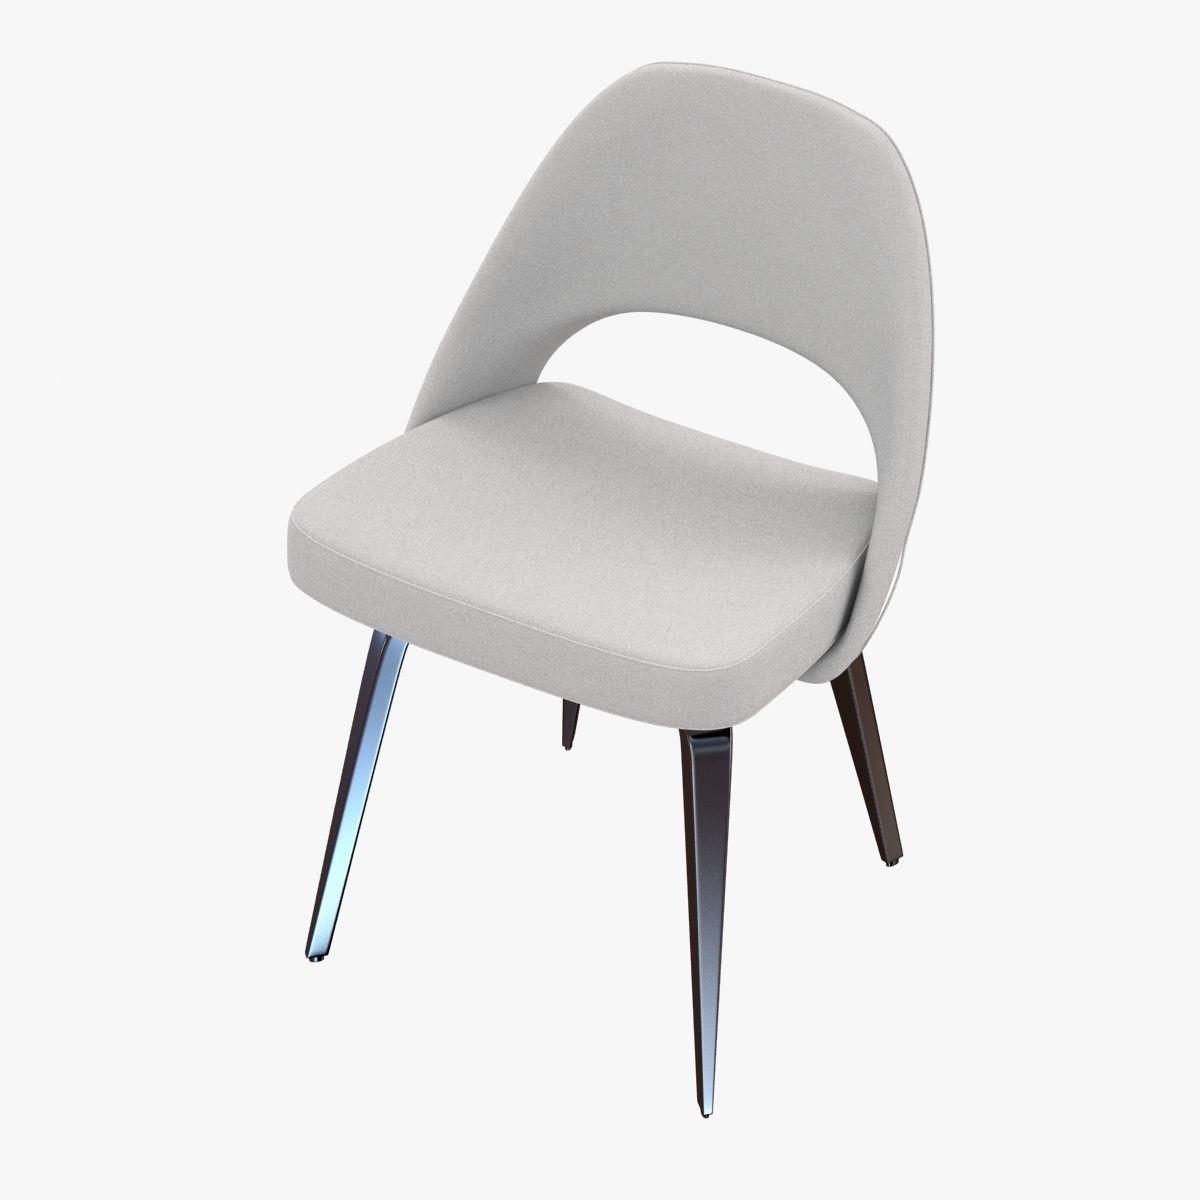 Saarinen Executive Side Chair 3d Model Max Obj 3ds Fbx Mtl 2